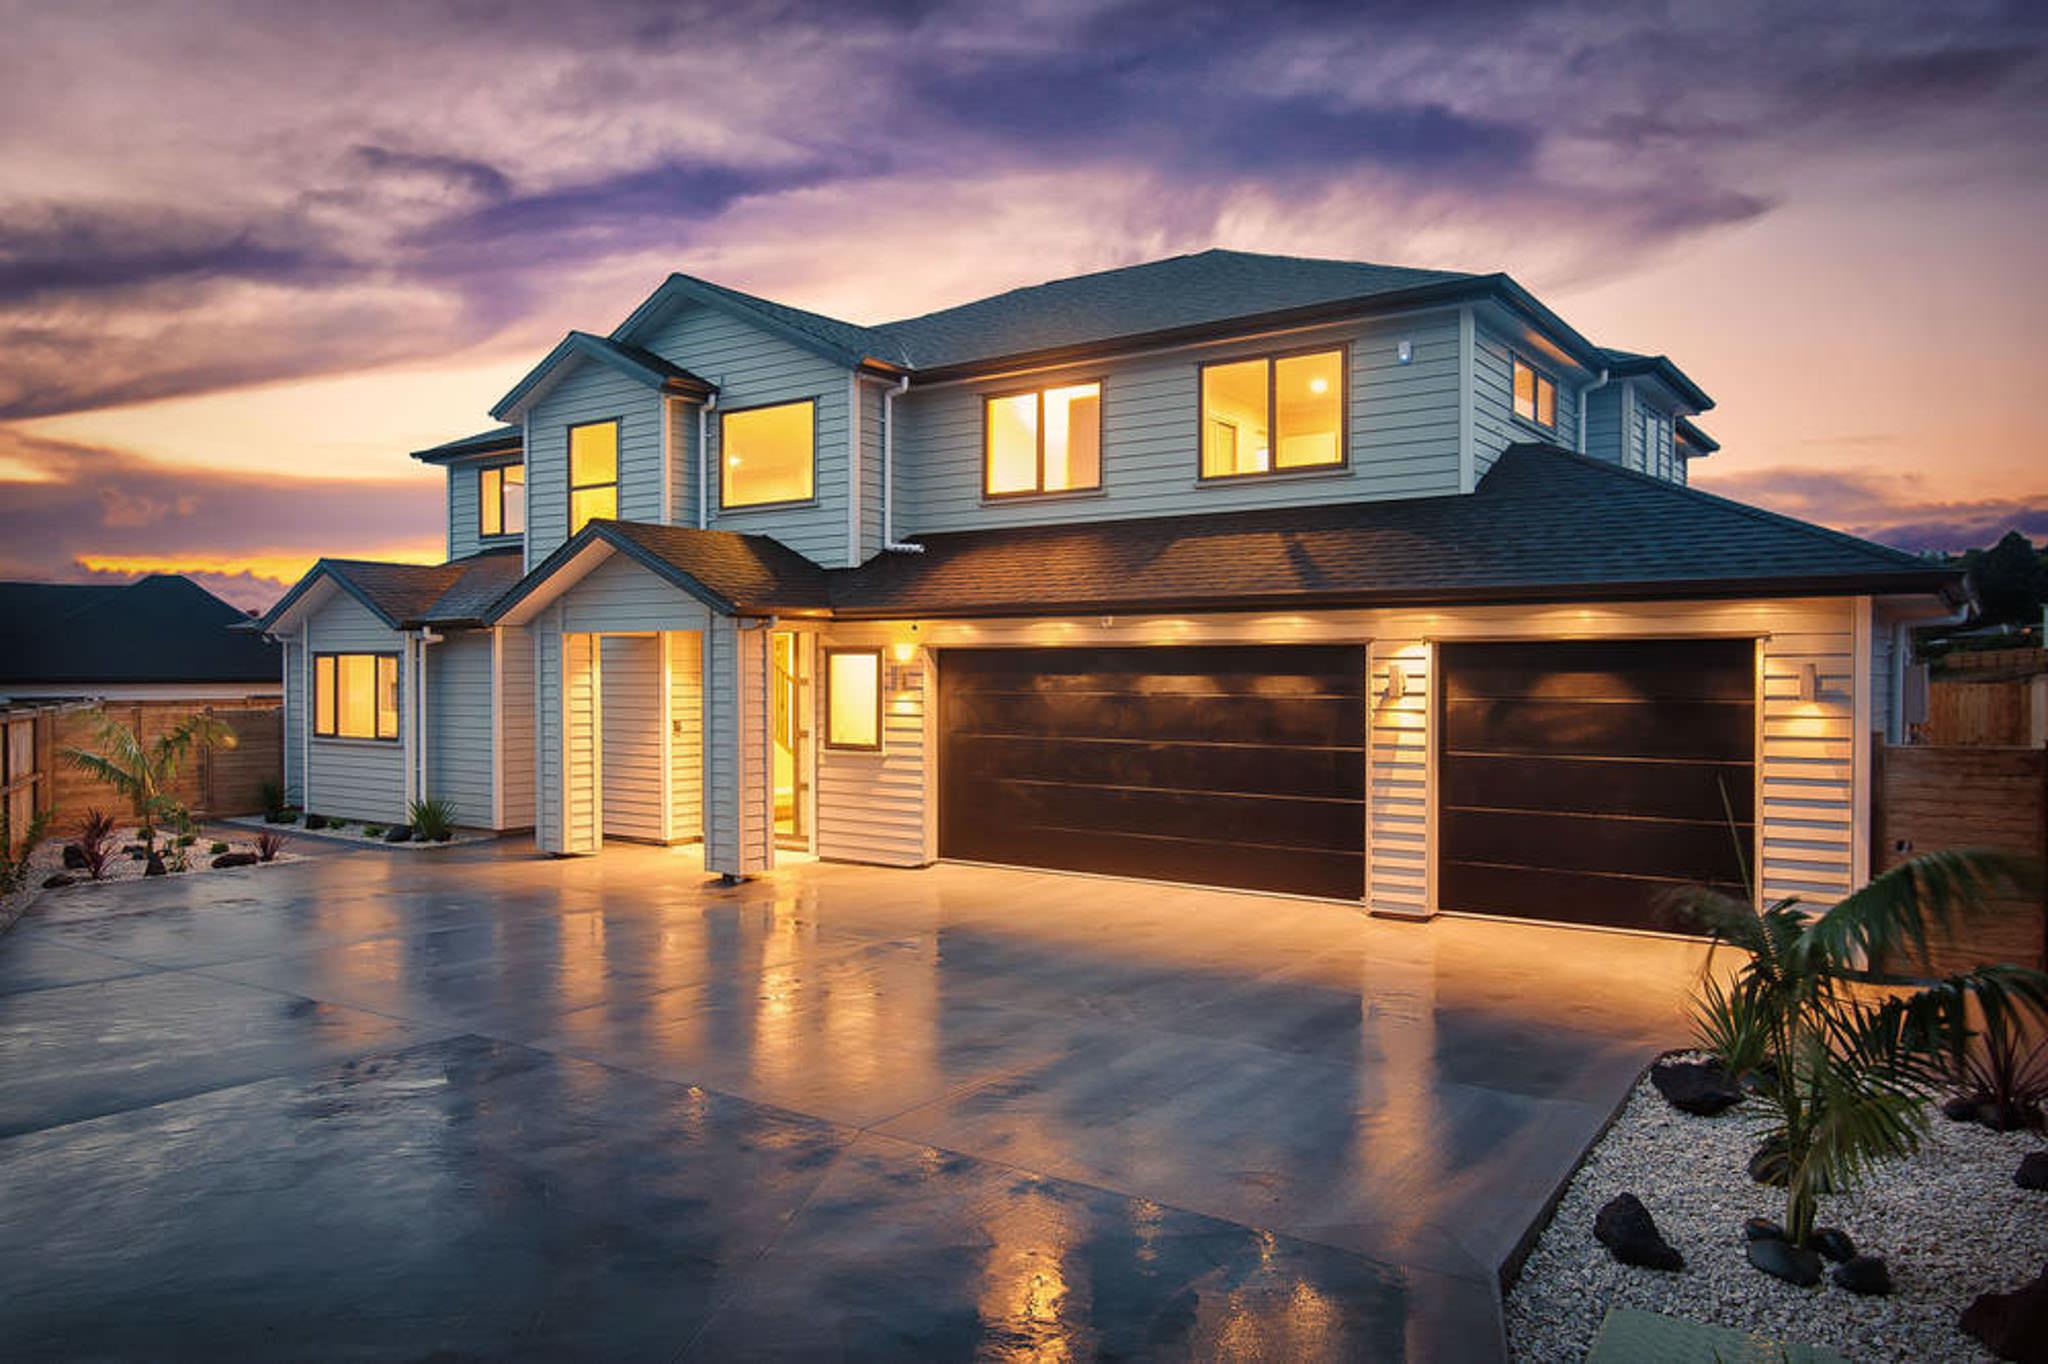 real estate photographer auckland new zealand-30.jpg